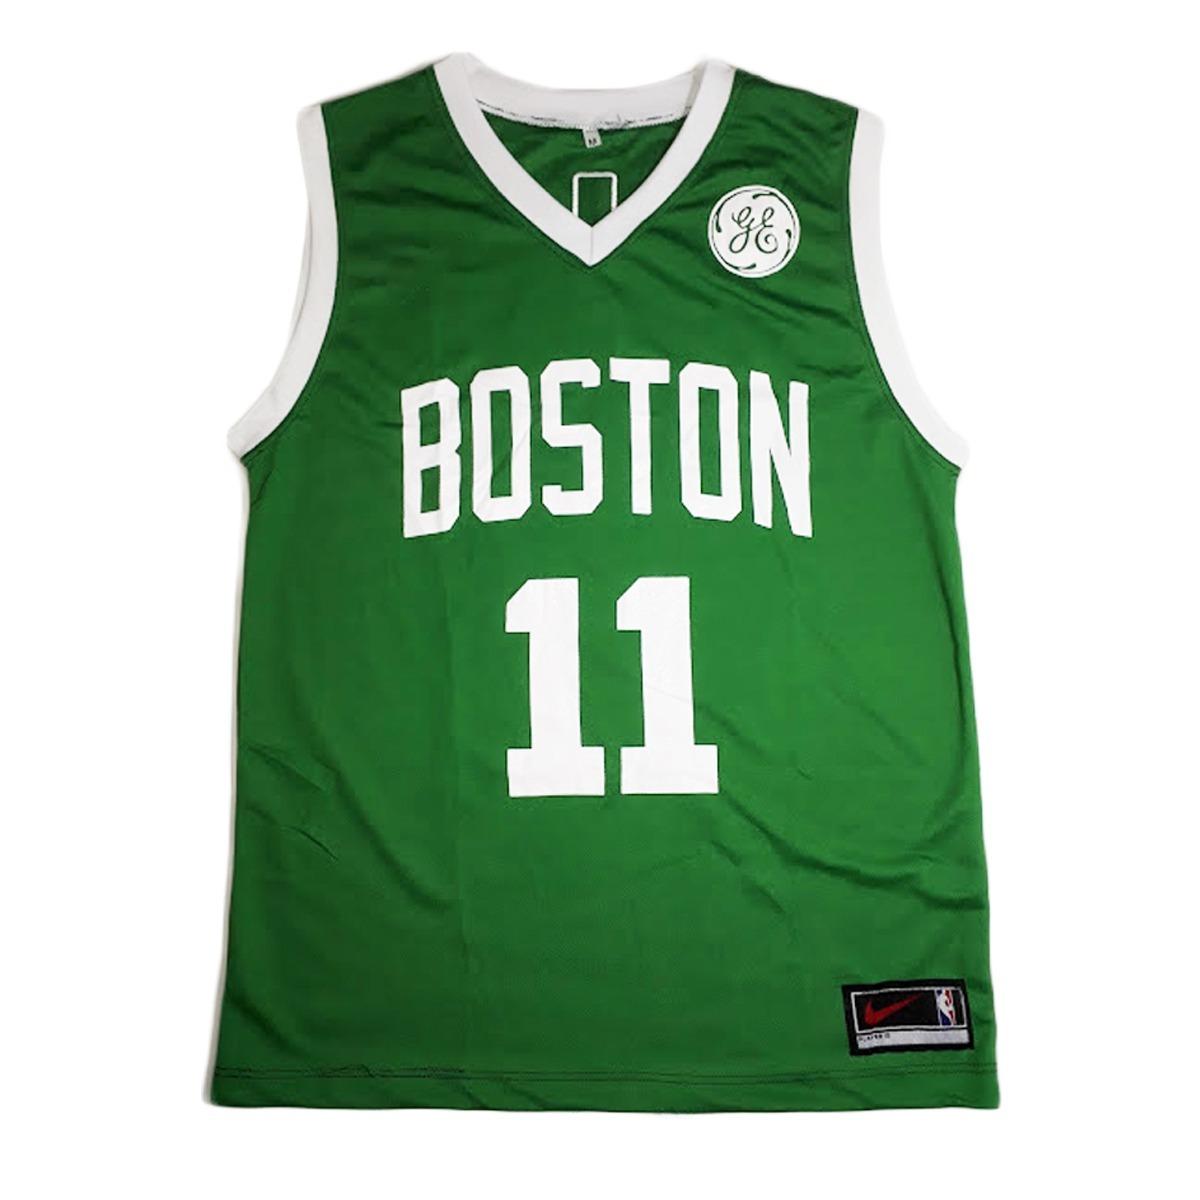 fc74b9da7 camisa regata de basquete boston celtics nba. Carregando zoom.